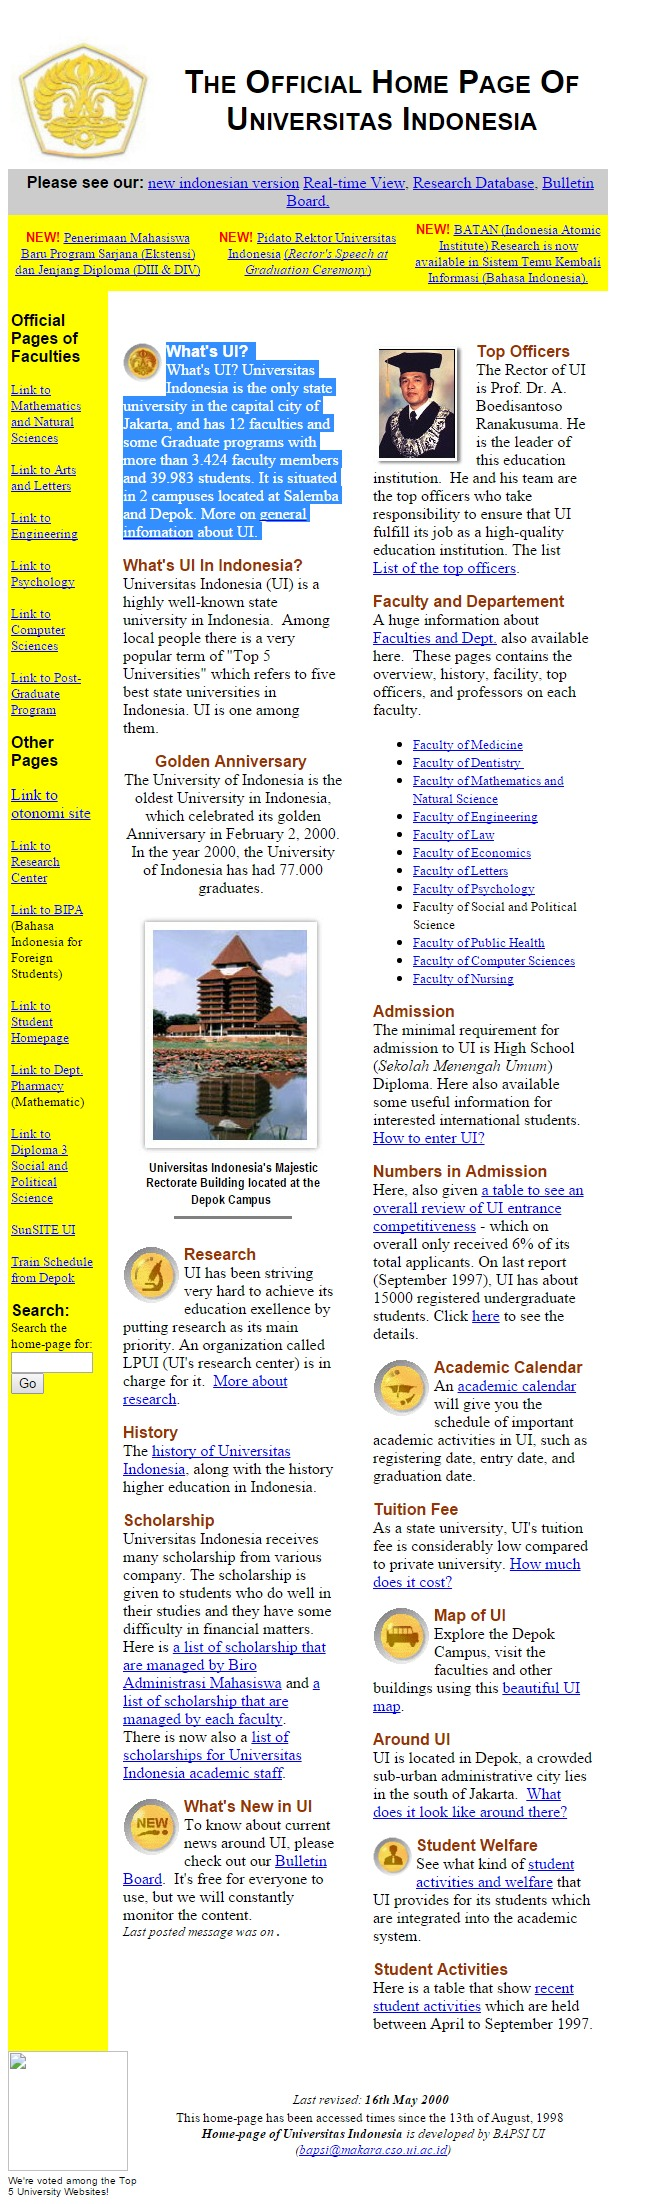 ui.ac.id 2000